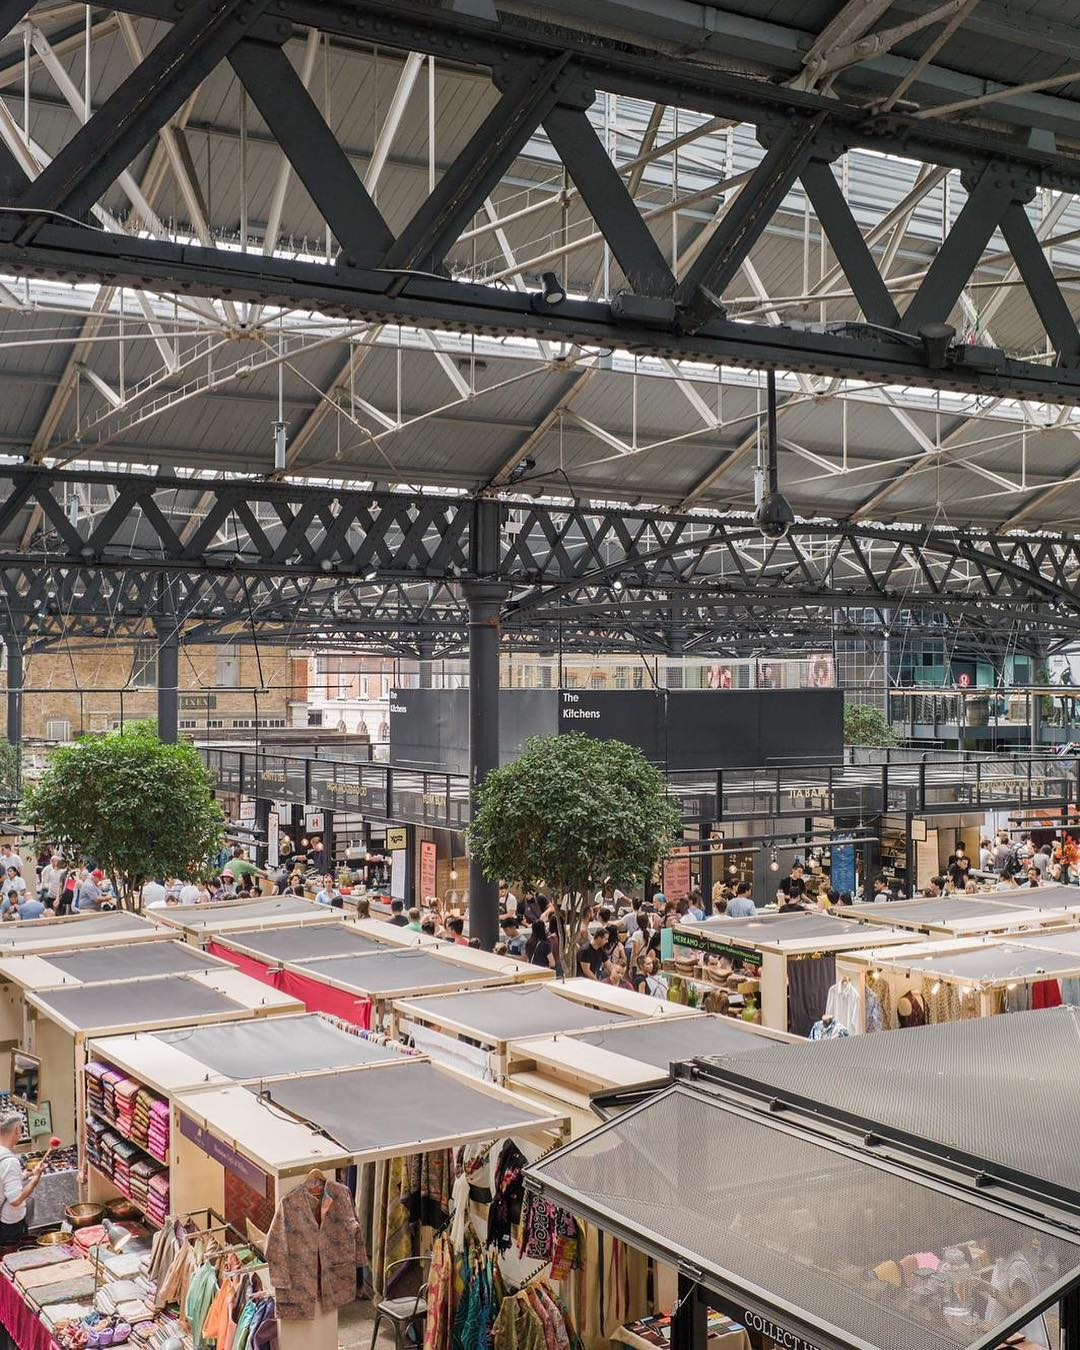 Dinerama Shoreditch: London's Best Indoor Food Halls And Markets • Napita